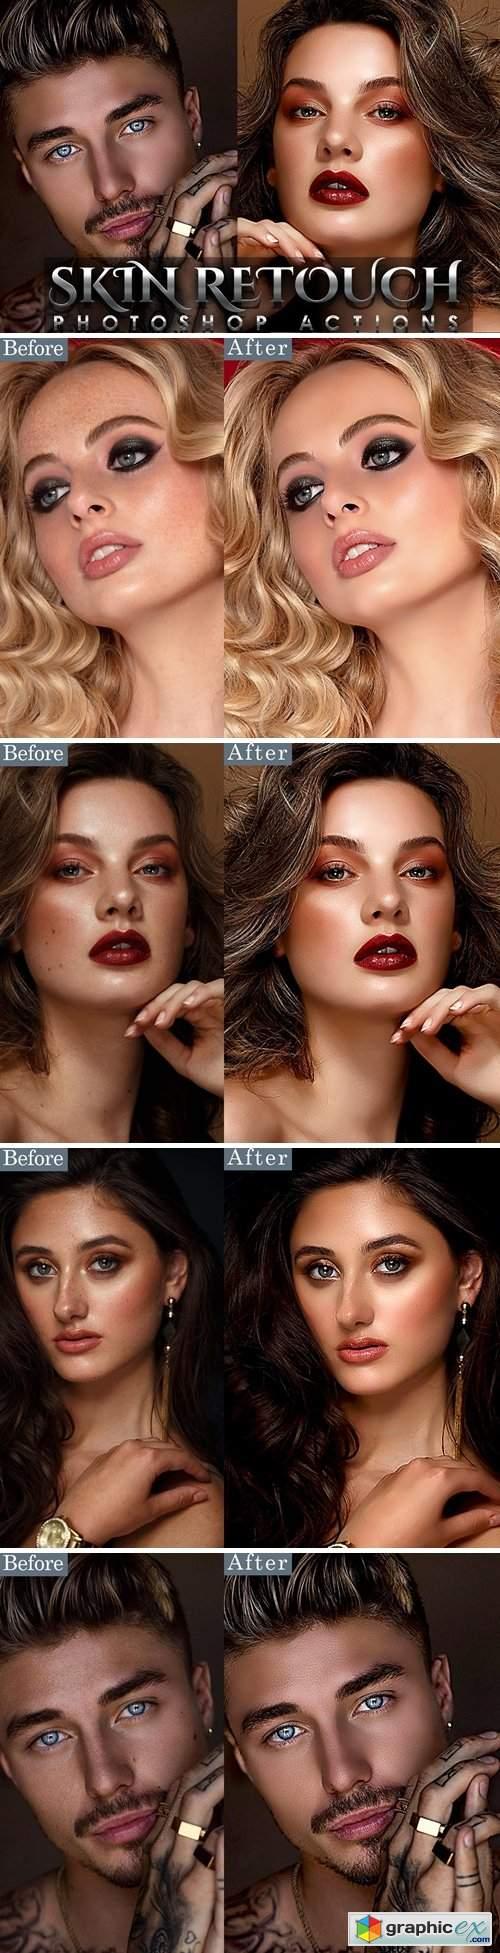 Skin Retouching Portrait Photoshop Action